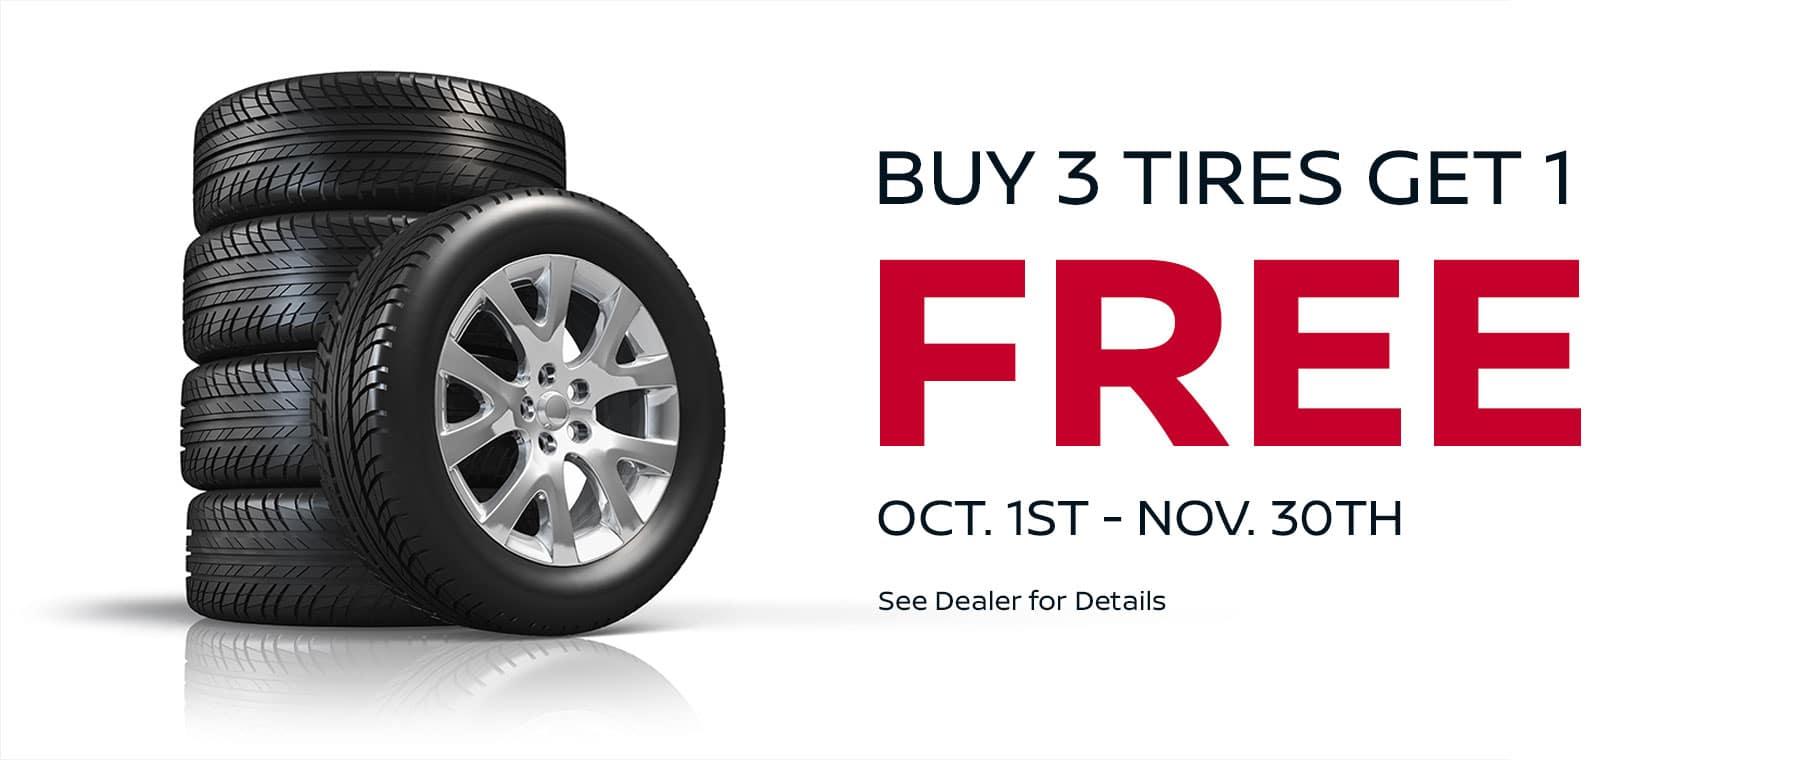 Buy 3 Tires Get 1 Free! Subtext: Oct. 1st - Nov. 30th